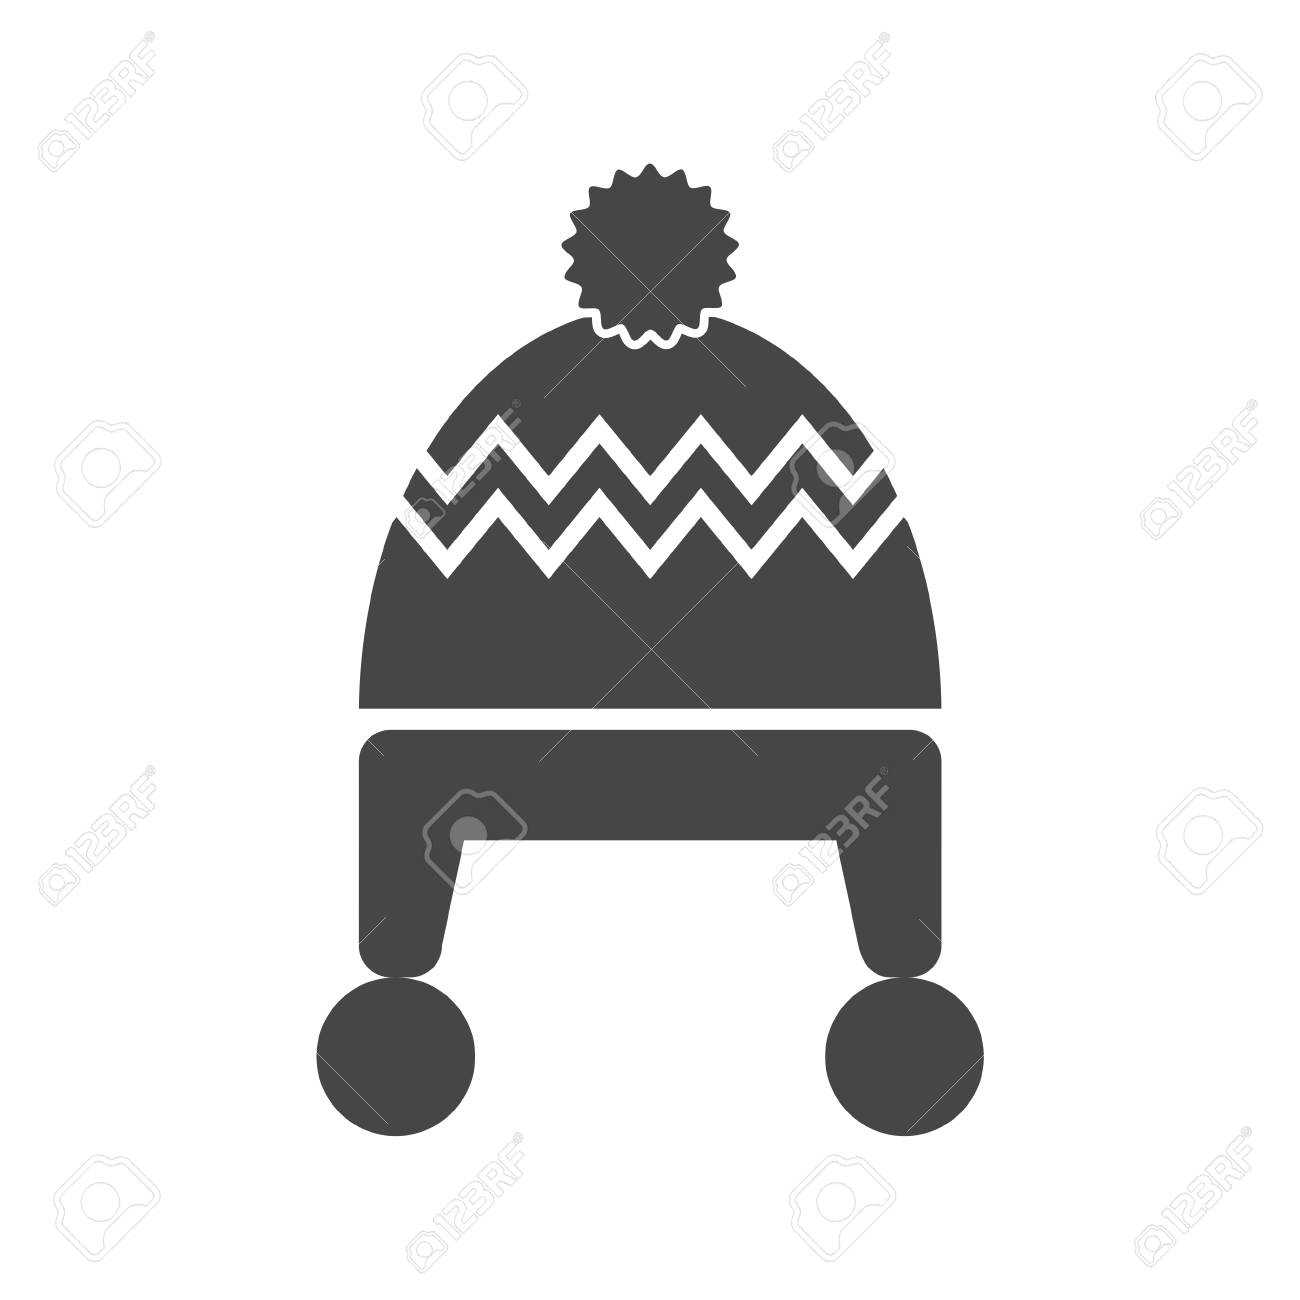 64ac99ddd22 Winter Snowboard Cap Icon - Vector Illustration Royalty Free ...